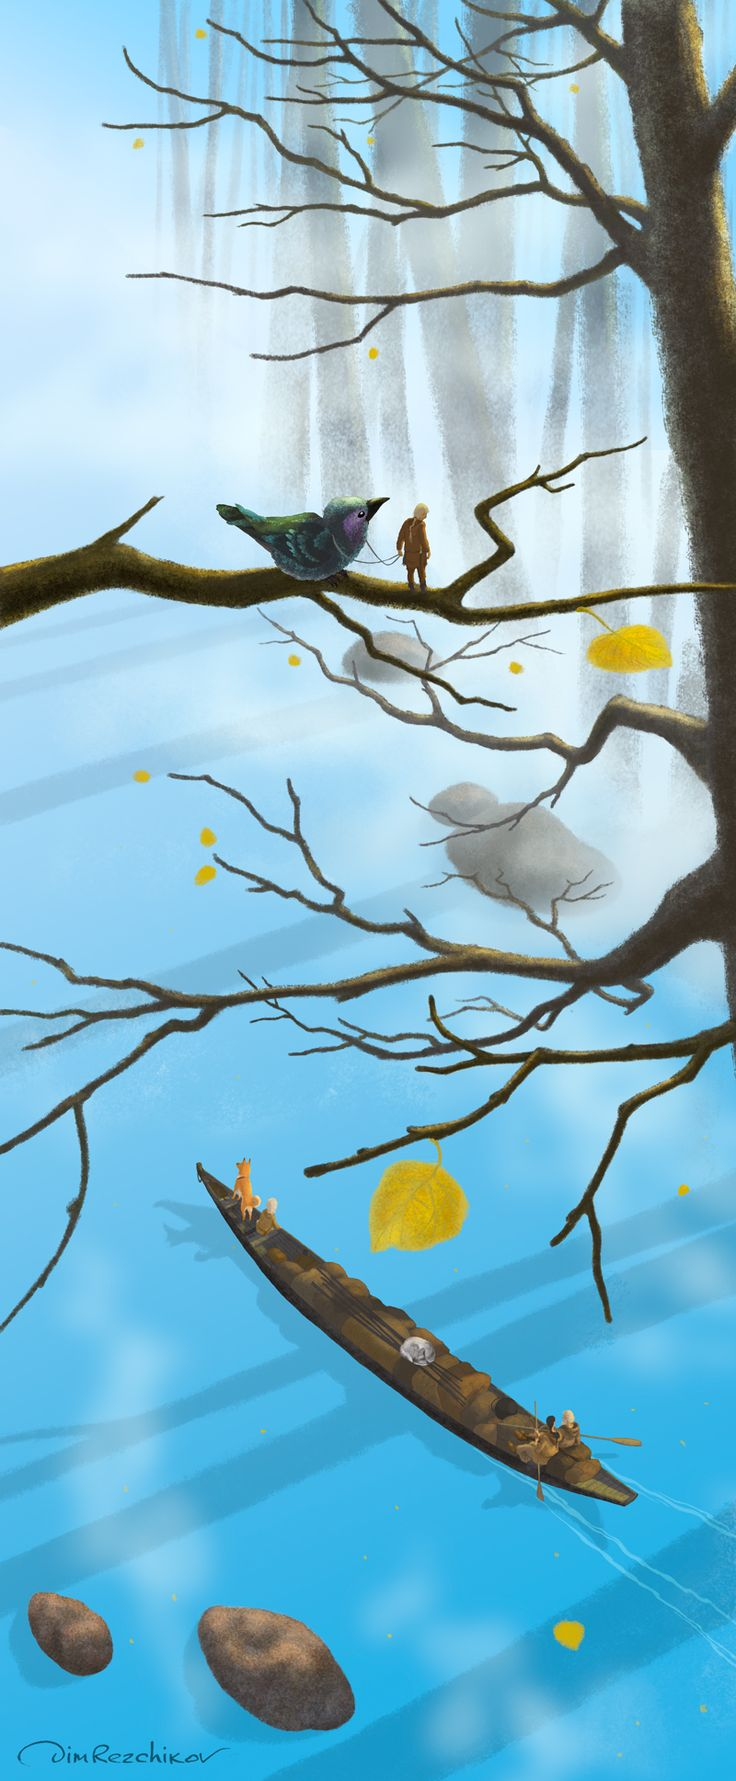 Downstream  Вниз по течению  art • russian • illustration • calendar • drawing • artist • illustrator • fantasy